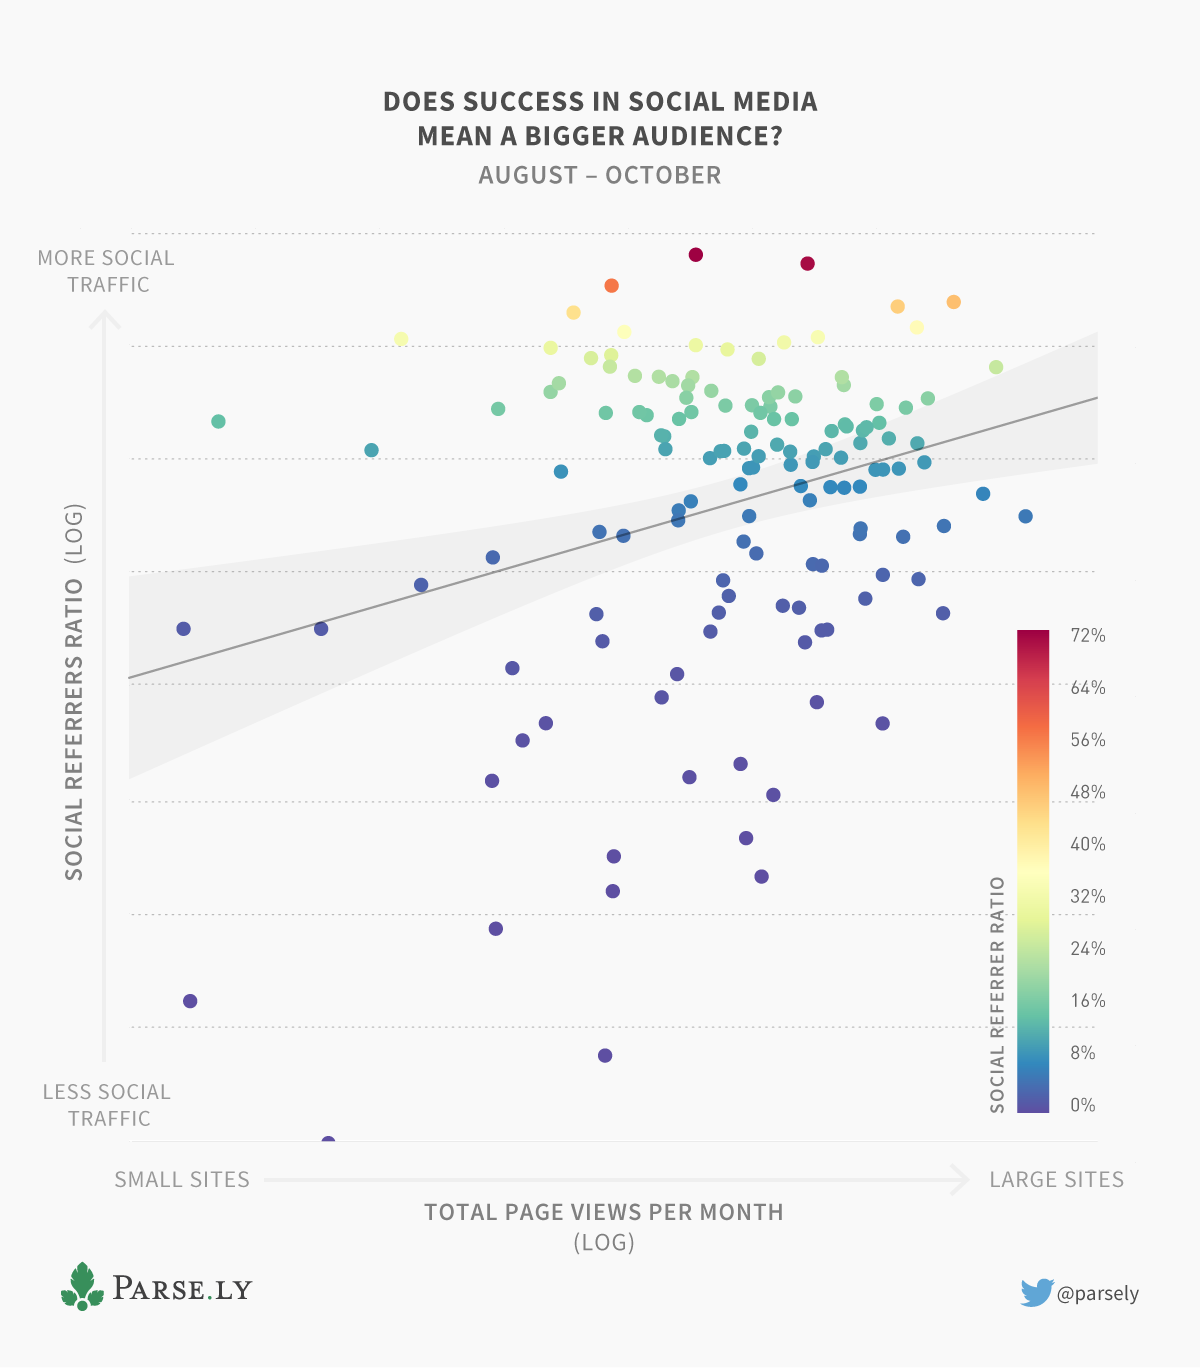 Social referrers vs overall traffic